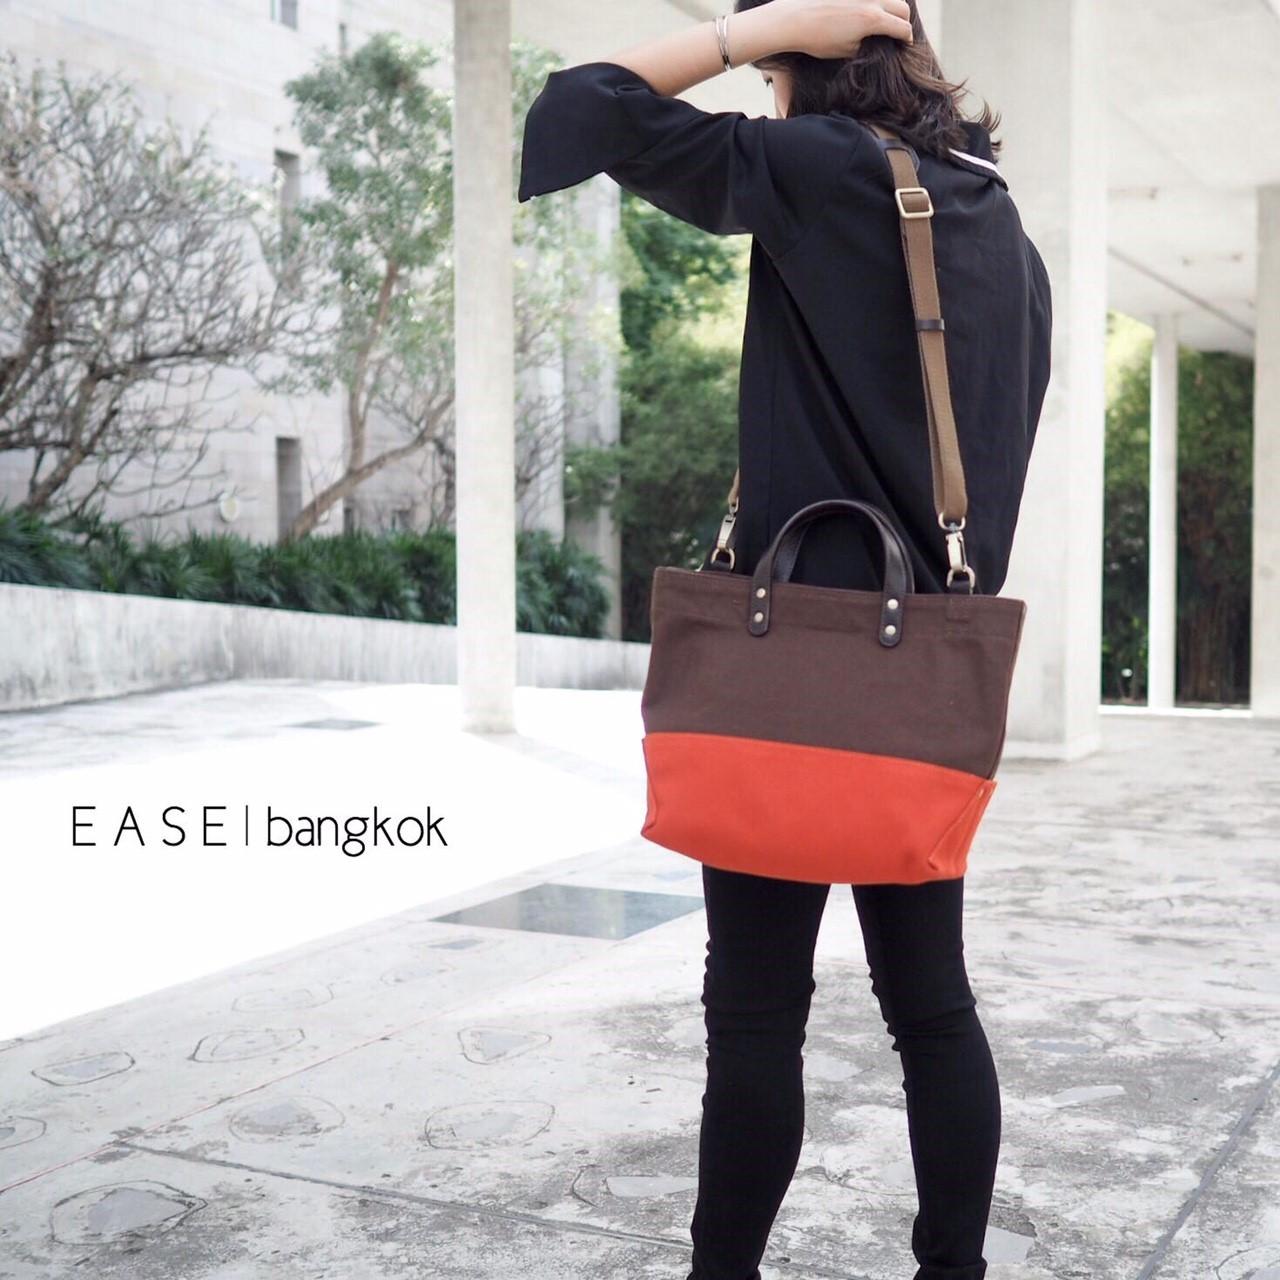 EASE - Daily Tote กระเป๋าผ้าแคนวาส + หนังวัวแท้